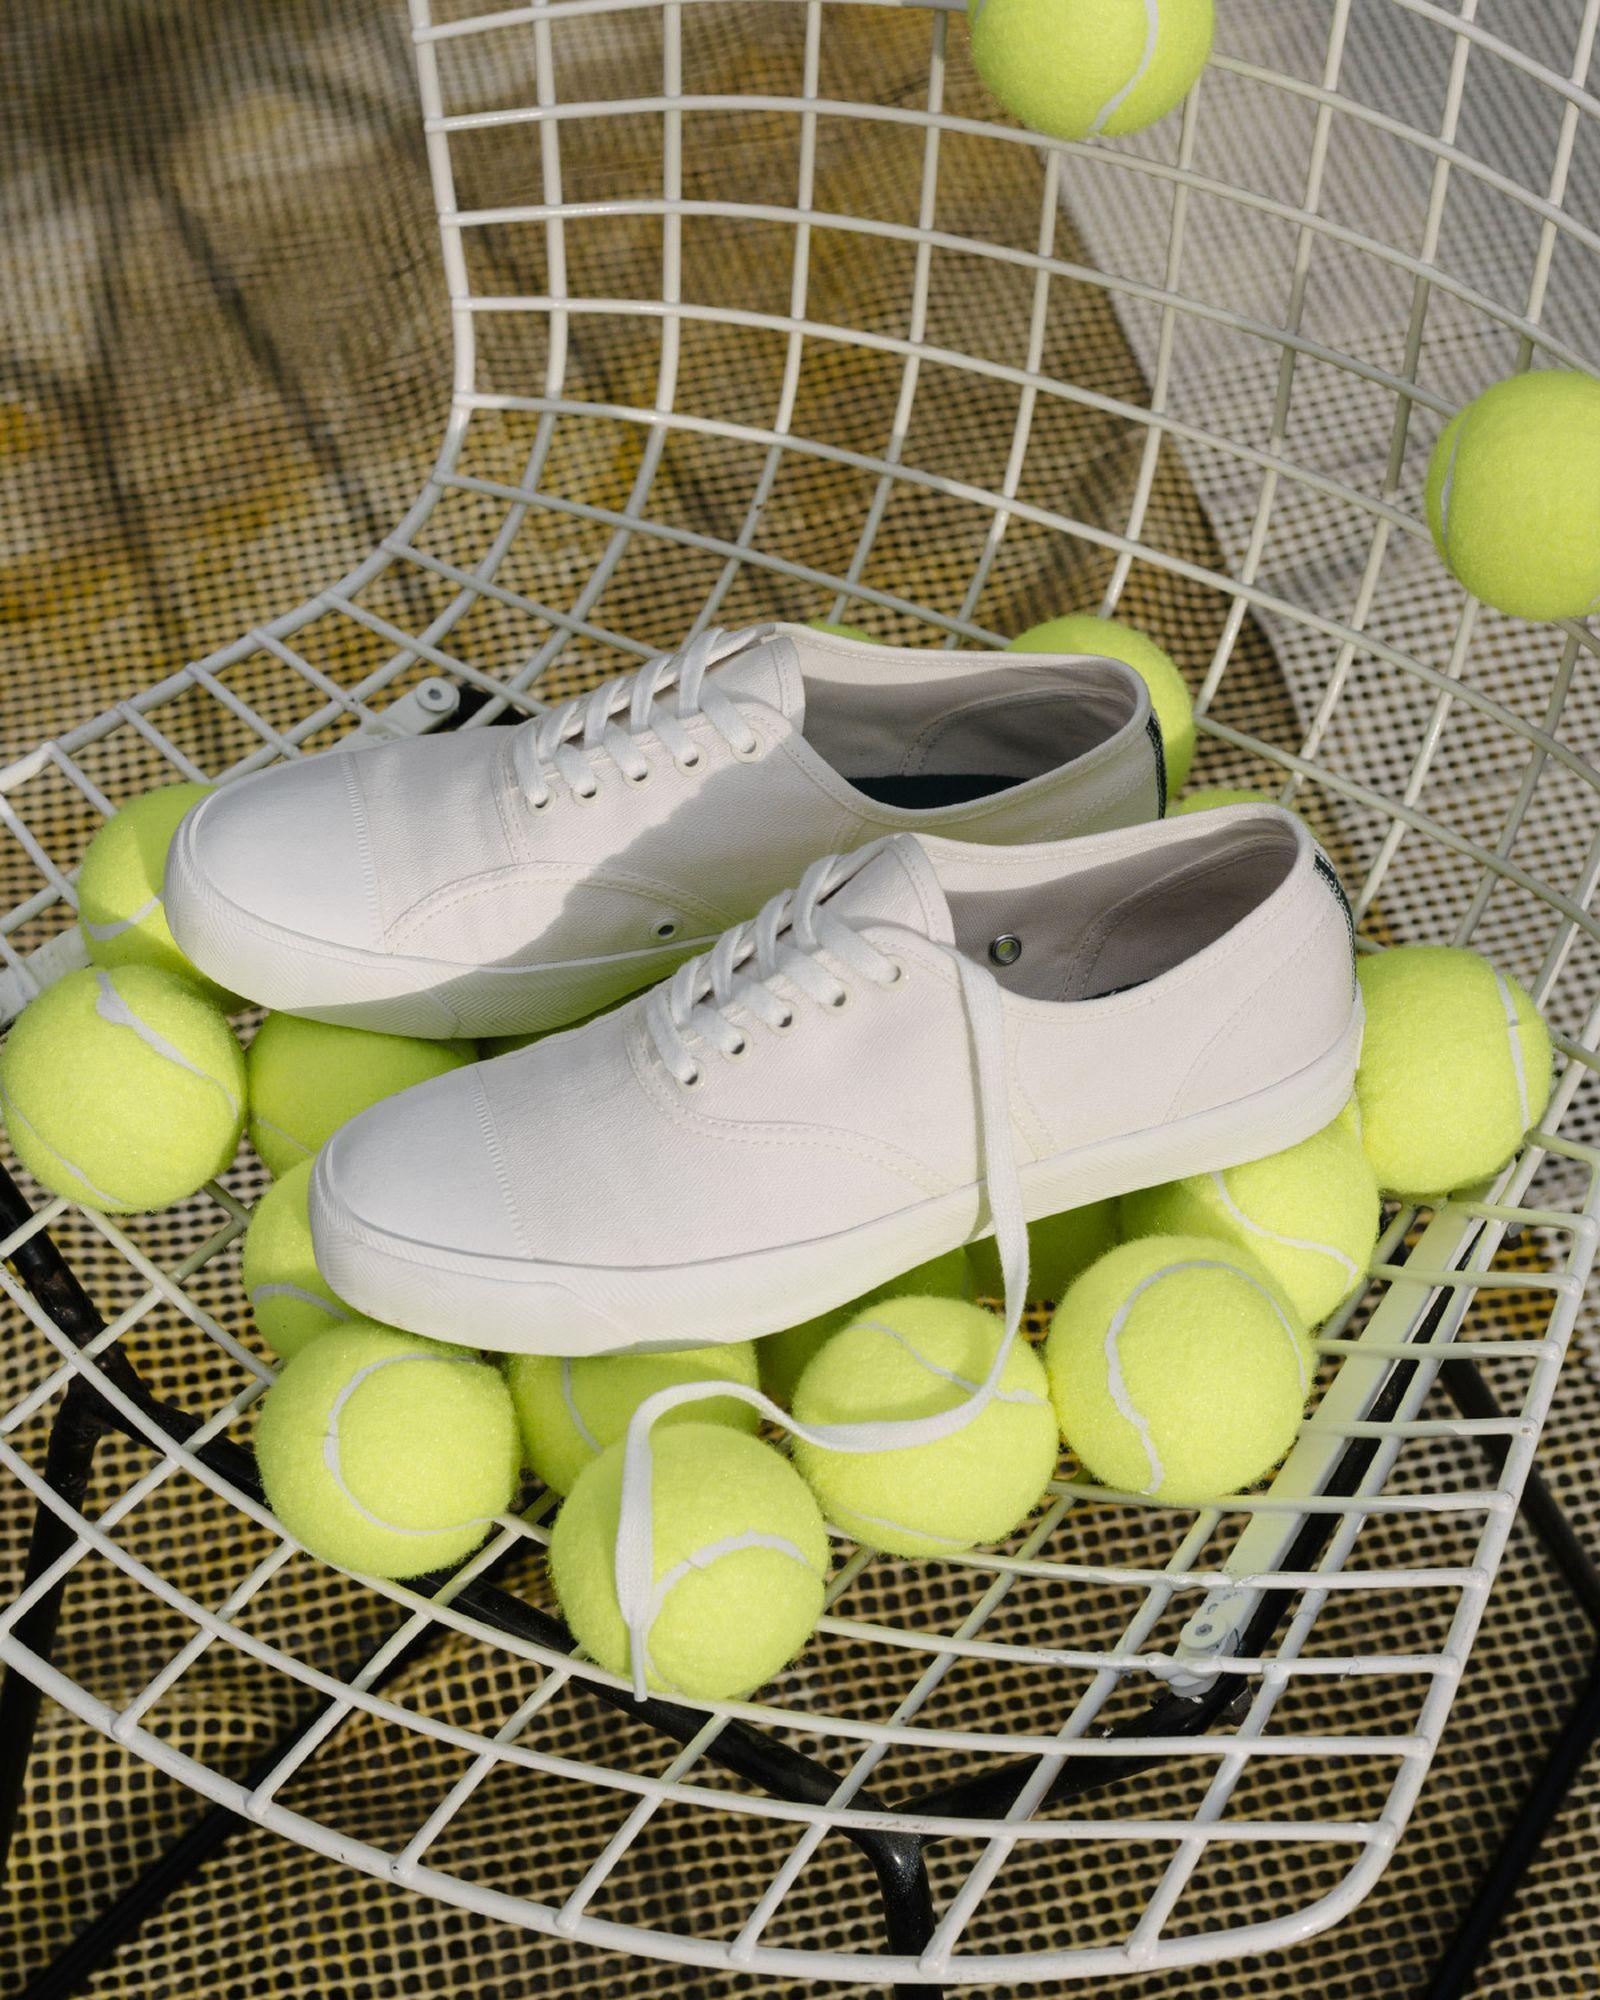 lacoste-sneakers-10